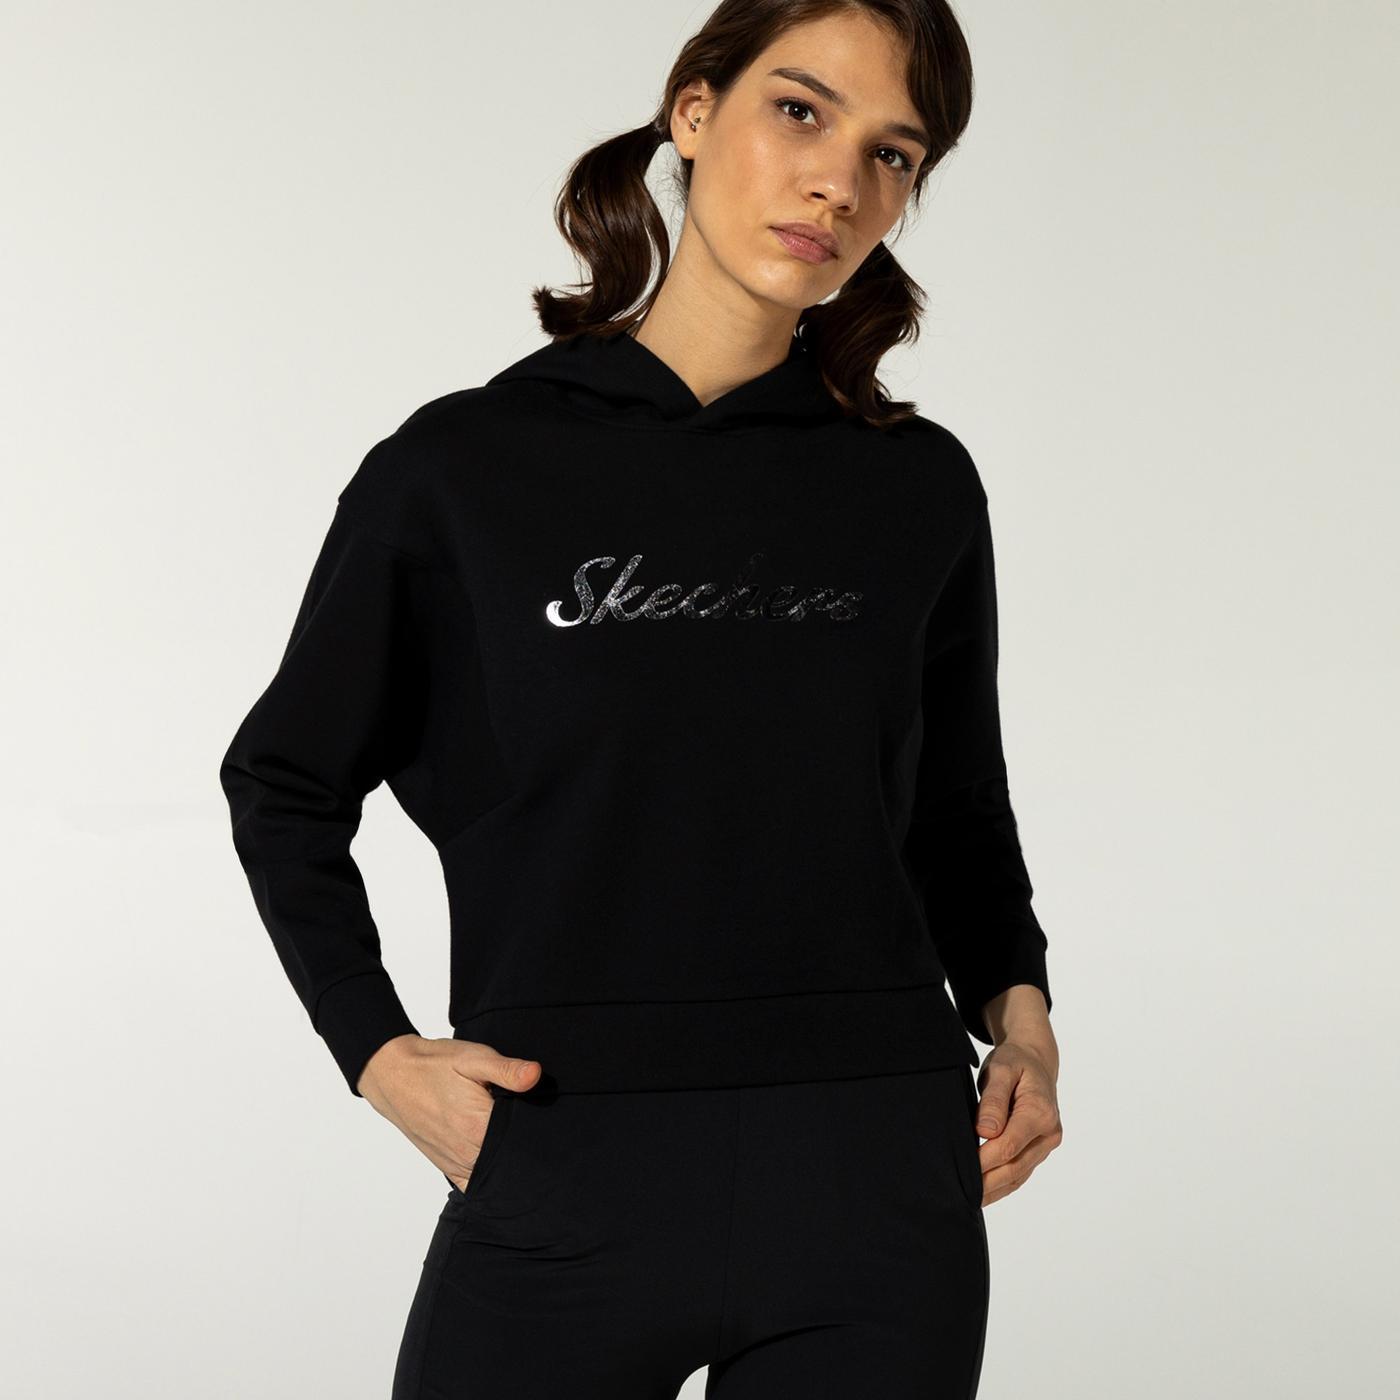 Skechers 2XI-Lock Kadın Siyah Sweatshirt